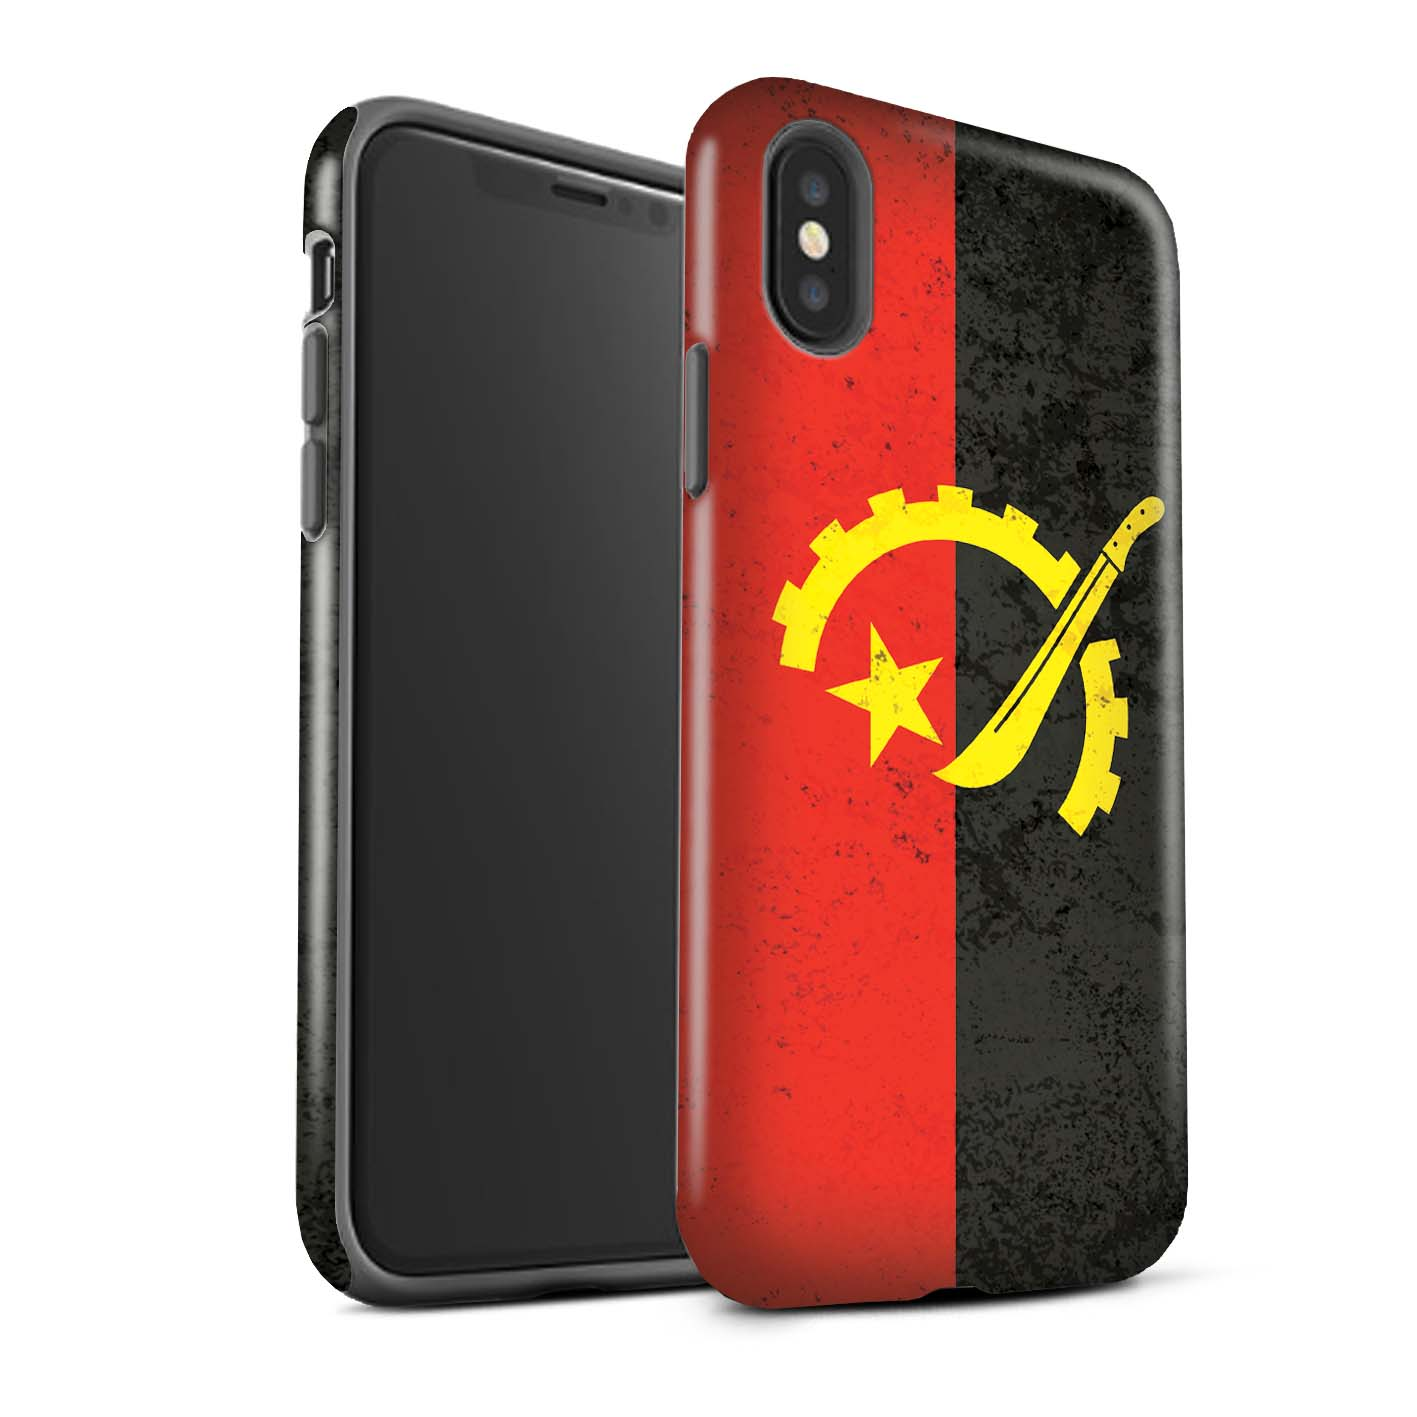 Personalised-Matte-Phone-Case-for-Apple-iPhone-XR-Custom-Handwritten-Glitter